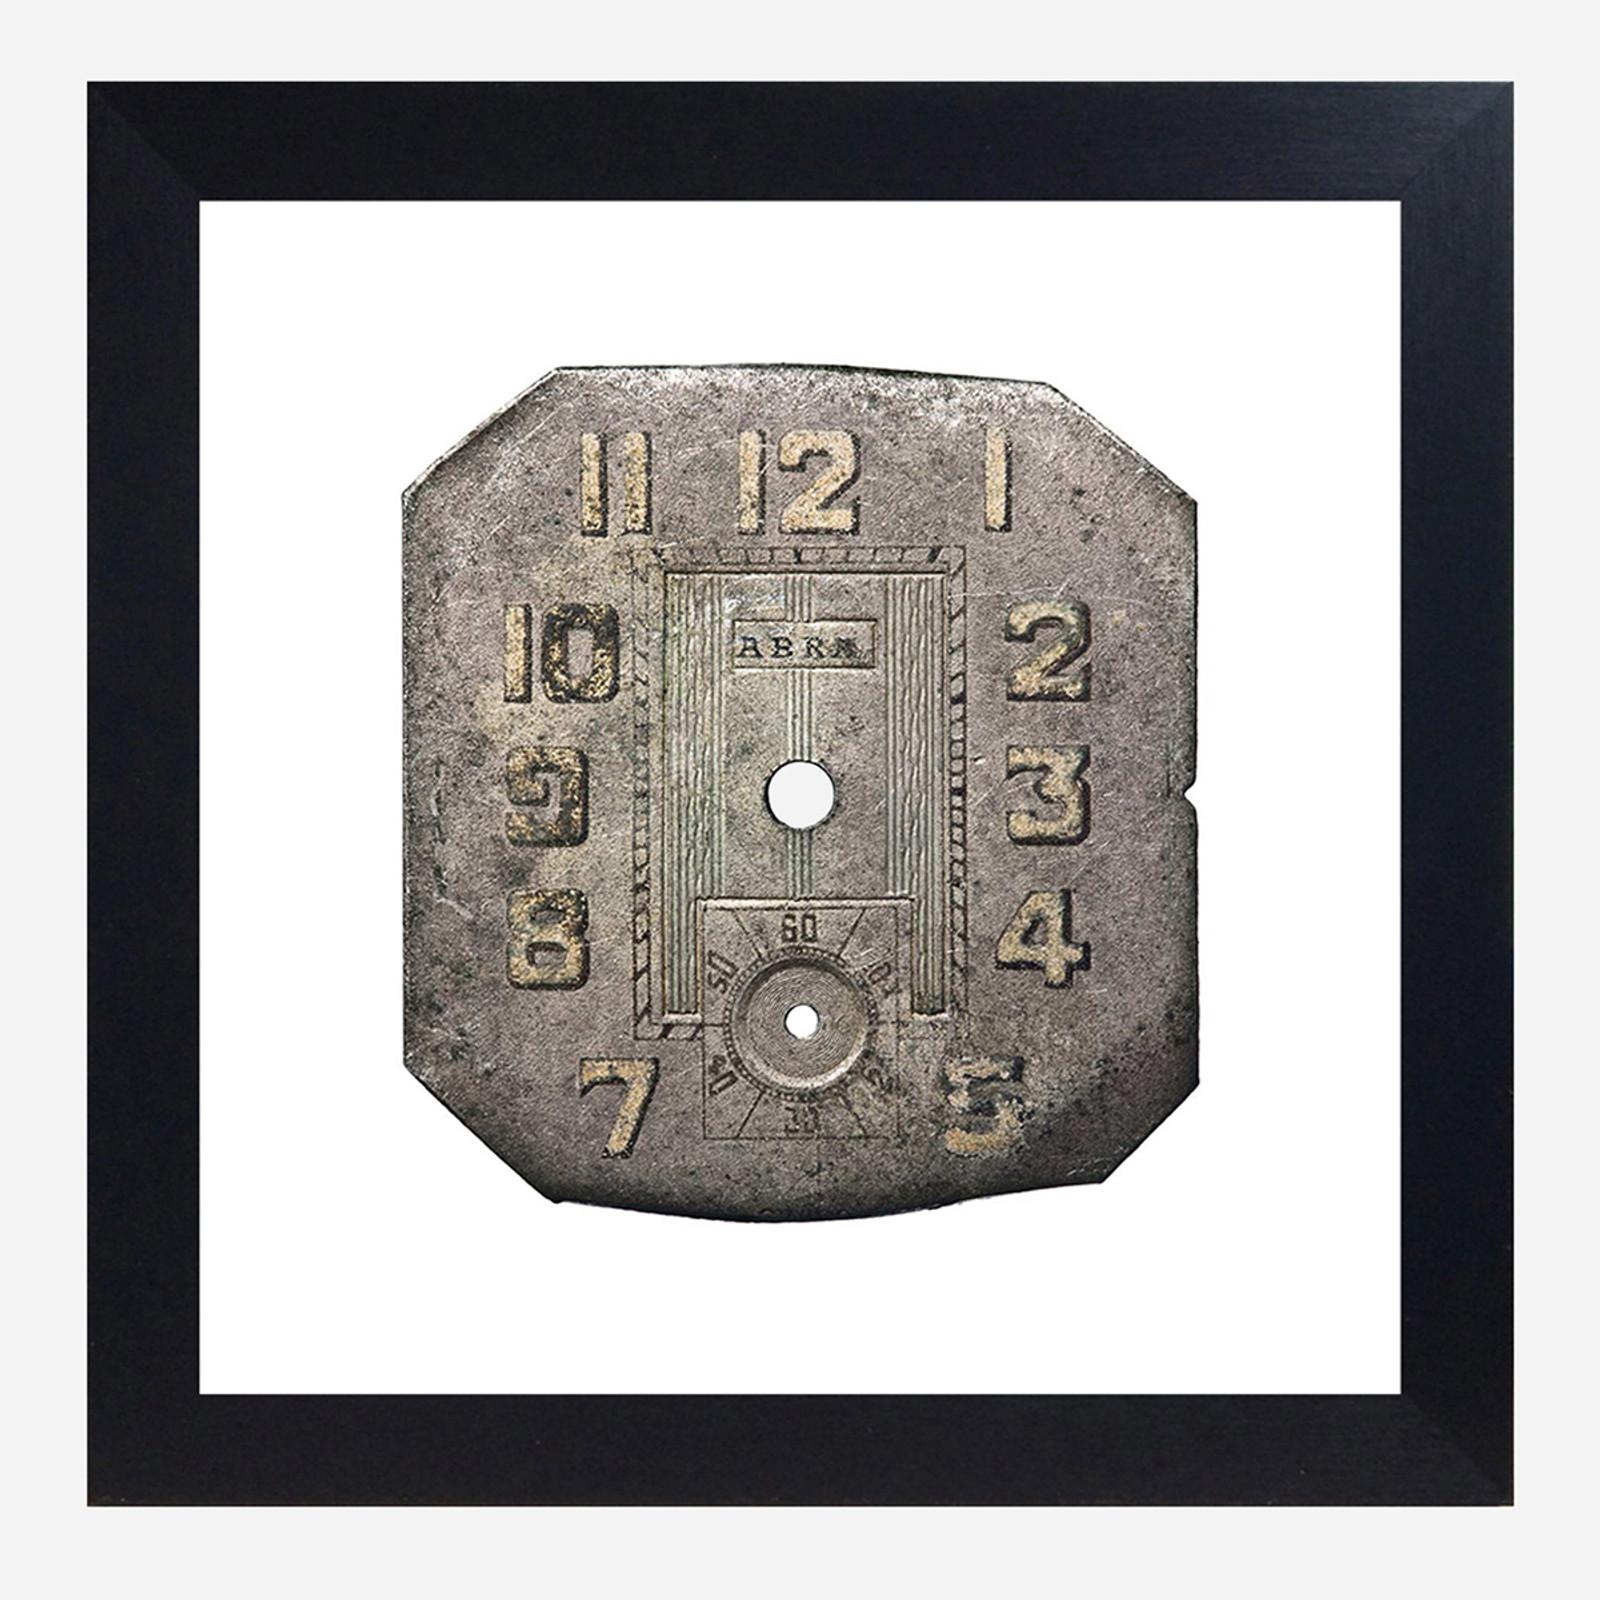 Framed Watch Face Print, Abra 10x10 (WHS Open Box Stock)